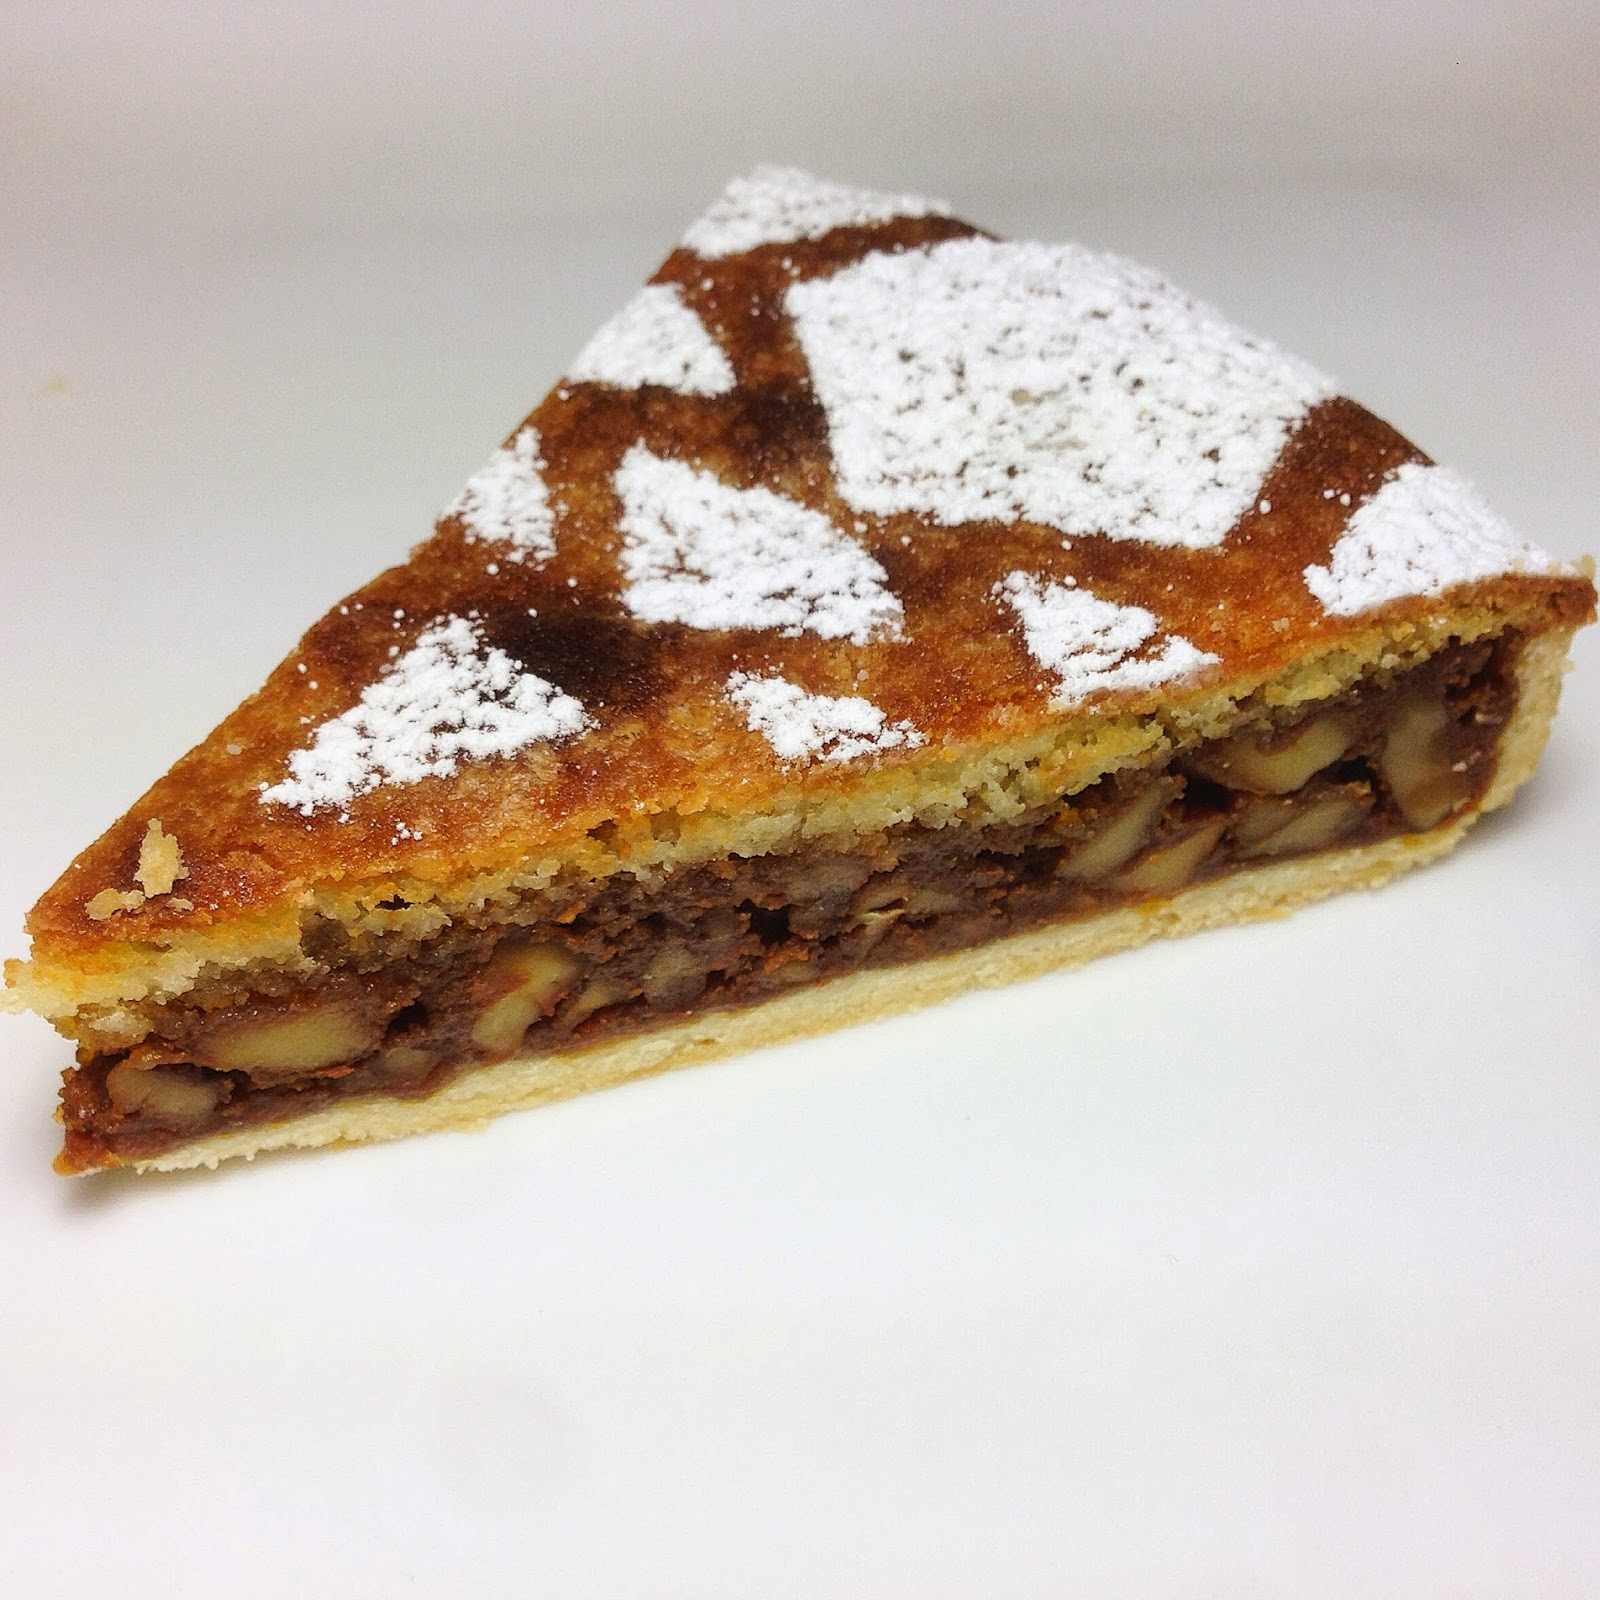 Slice of Caramel Nut Tart (Tarte aux Noix Caramel)